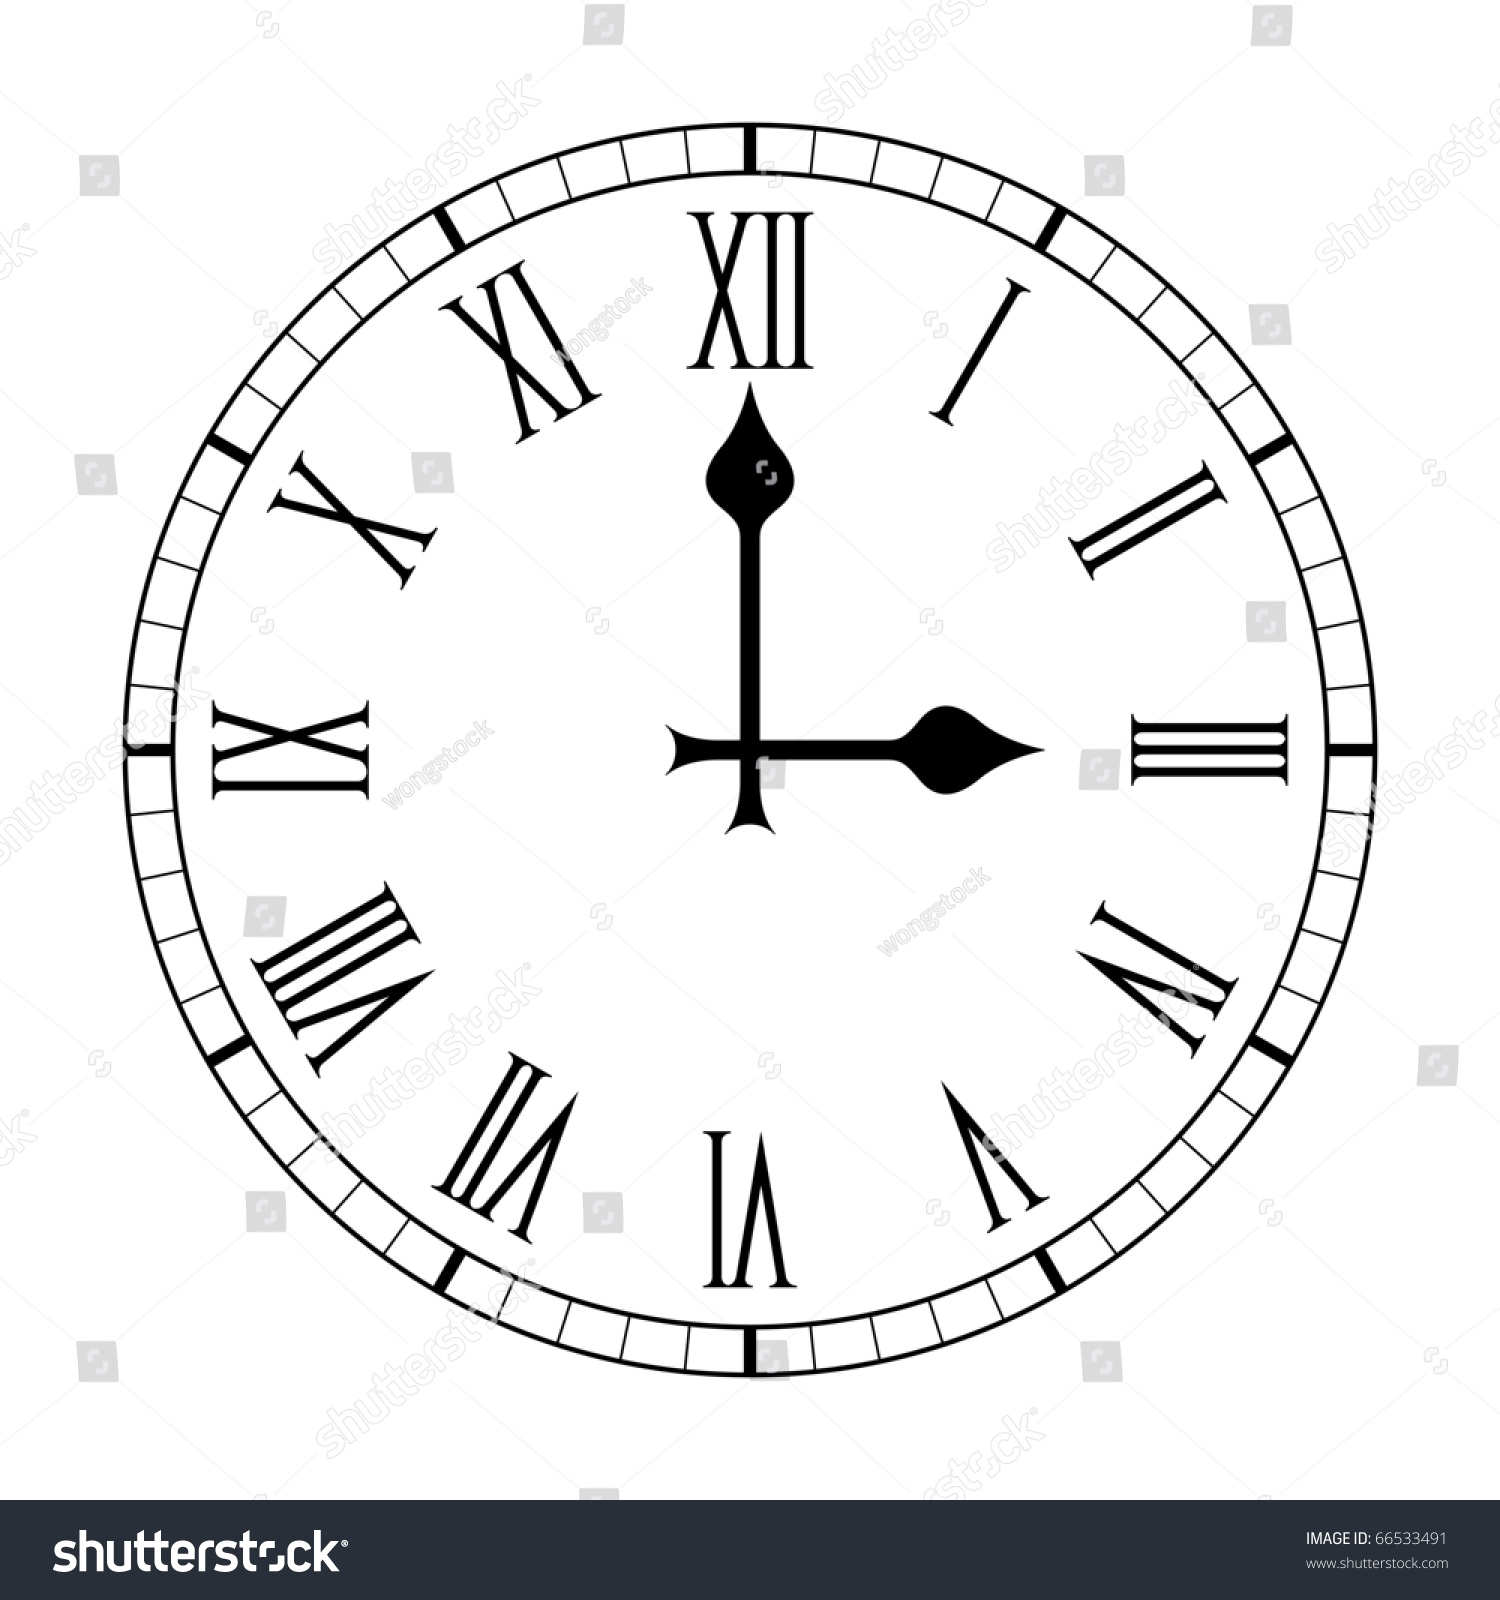 Plain Roman Numeral Clock Face Stock Vector 66533491